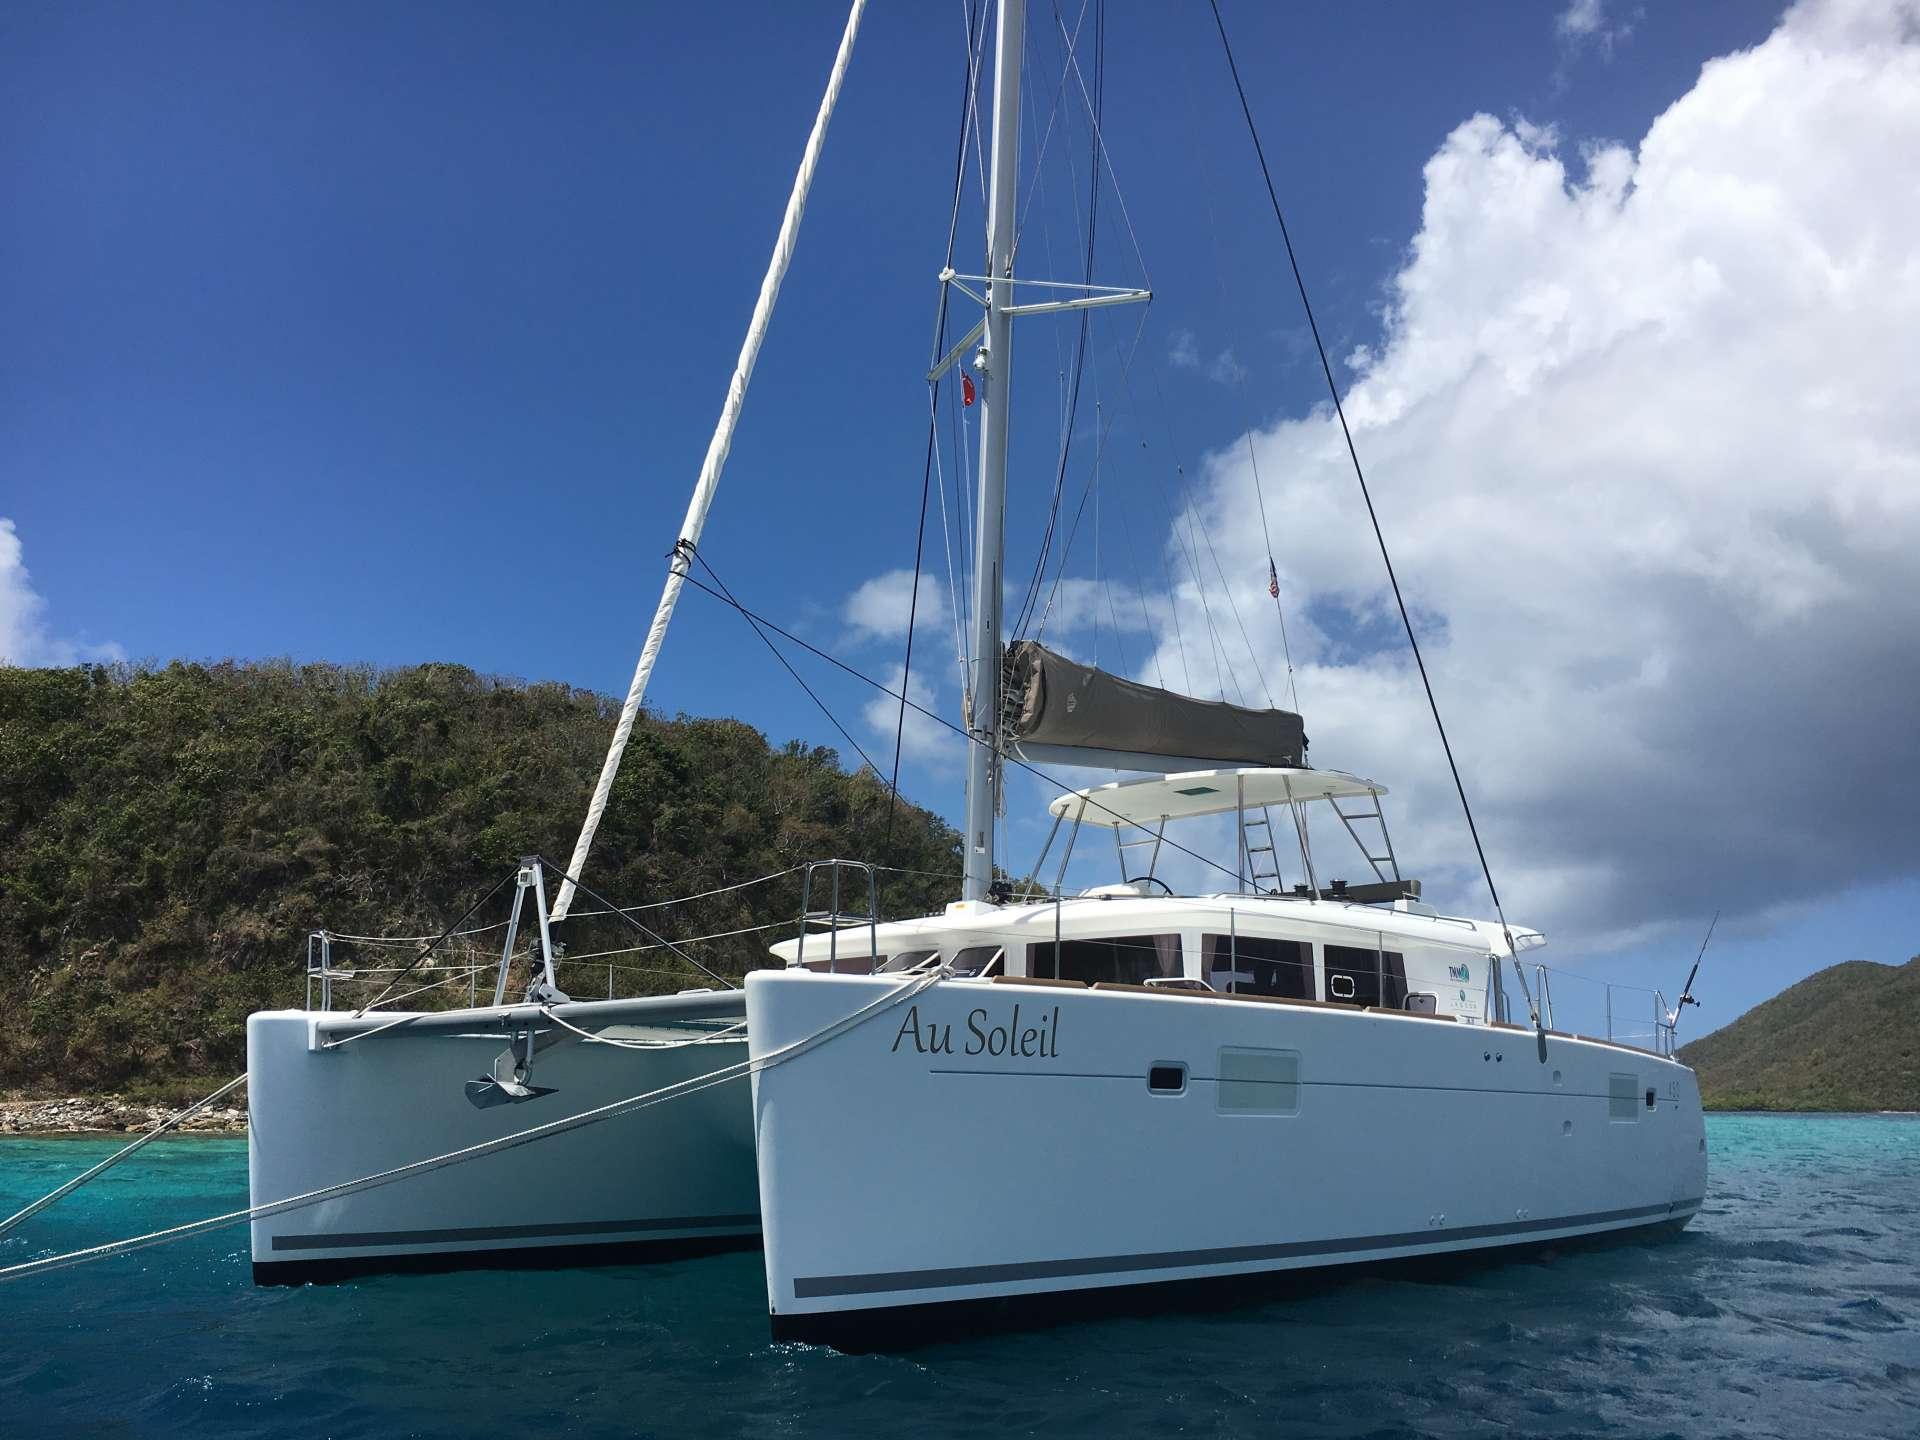 Catamaran AU SOLEIL